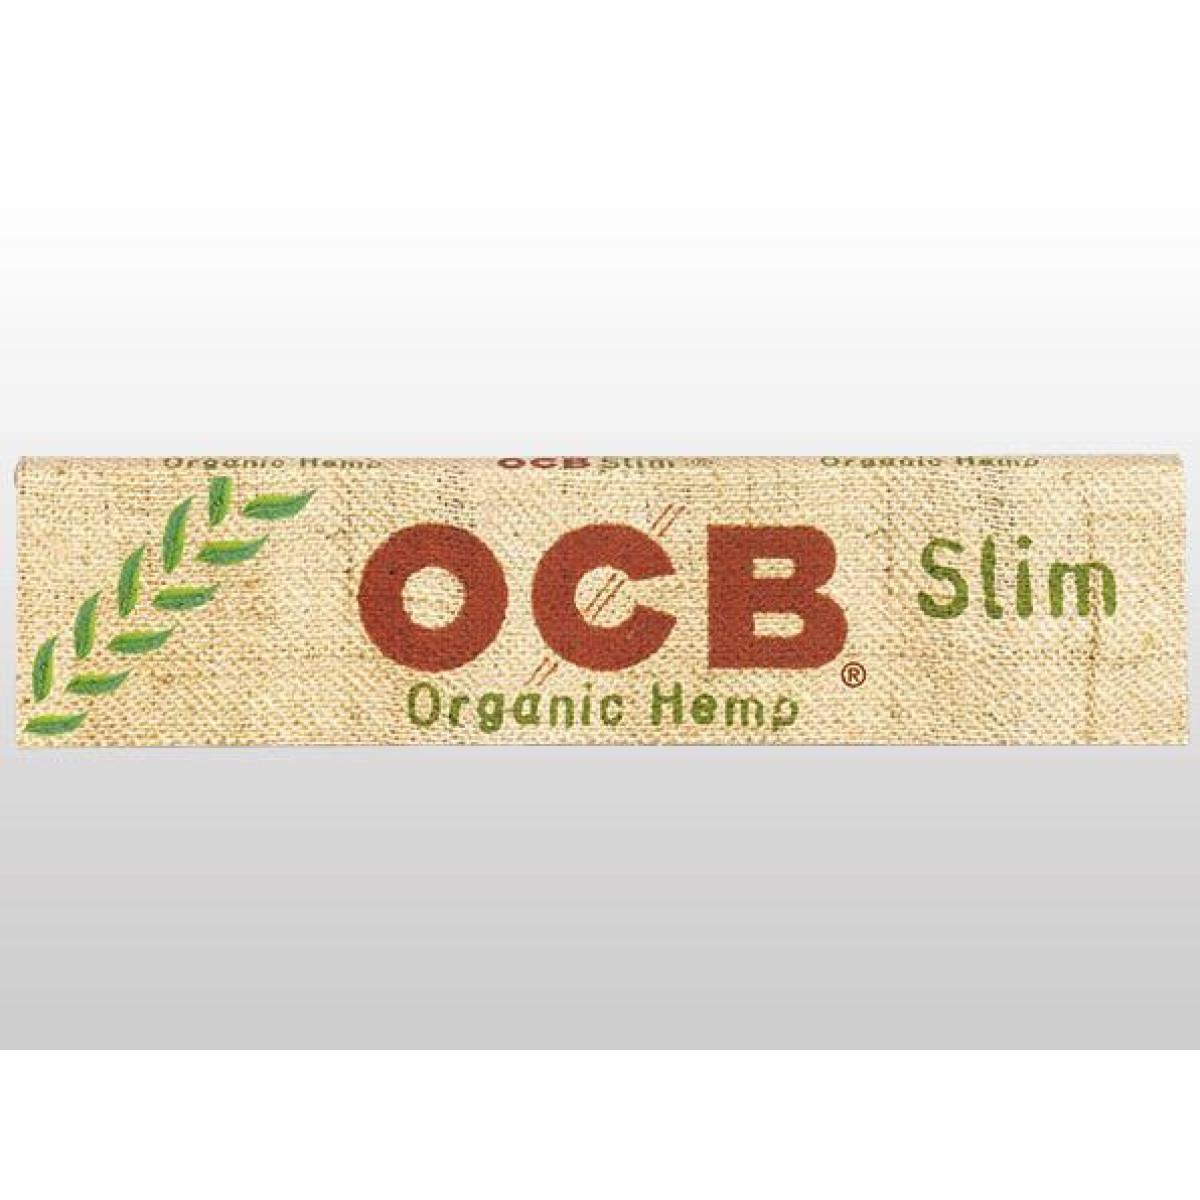 OCB ORGANIC HEMP KINGSIZE SLIM